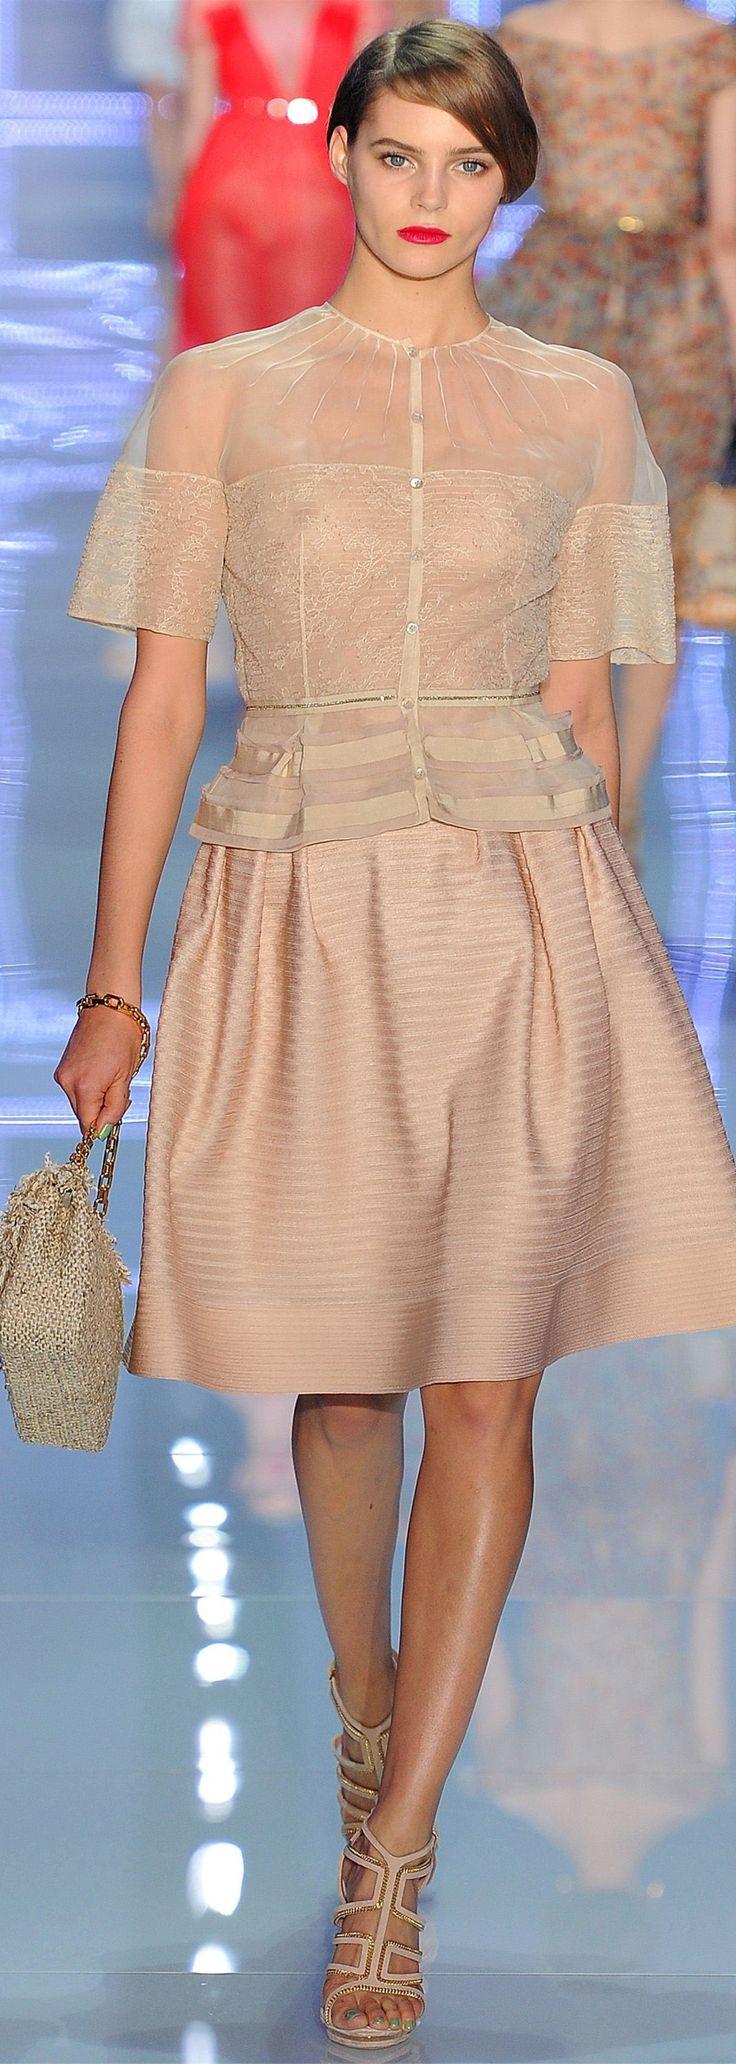 Christian Dior spring 2012 RTW.